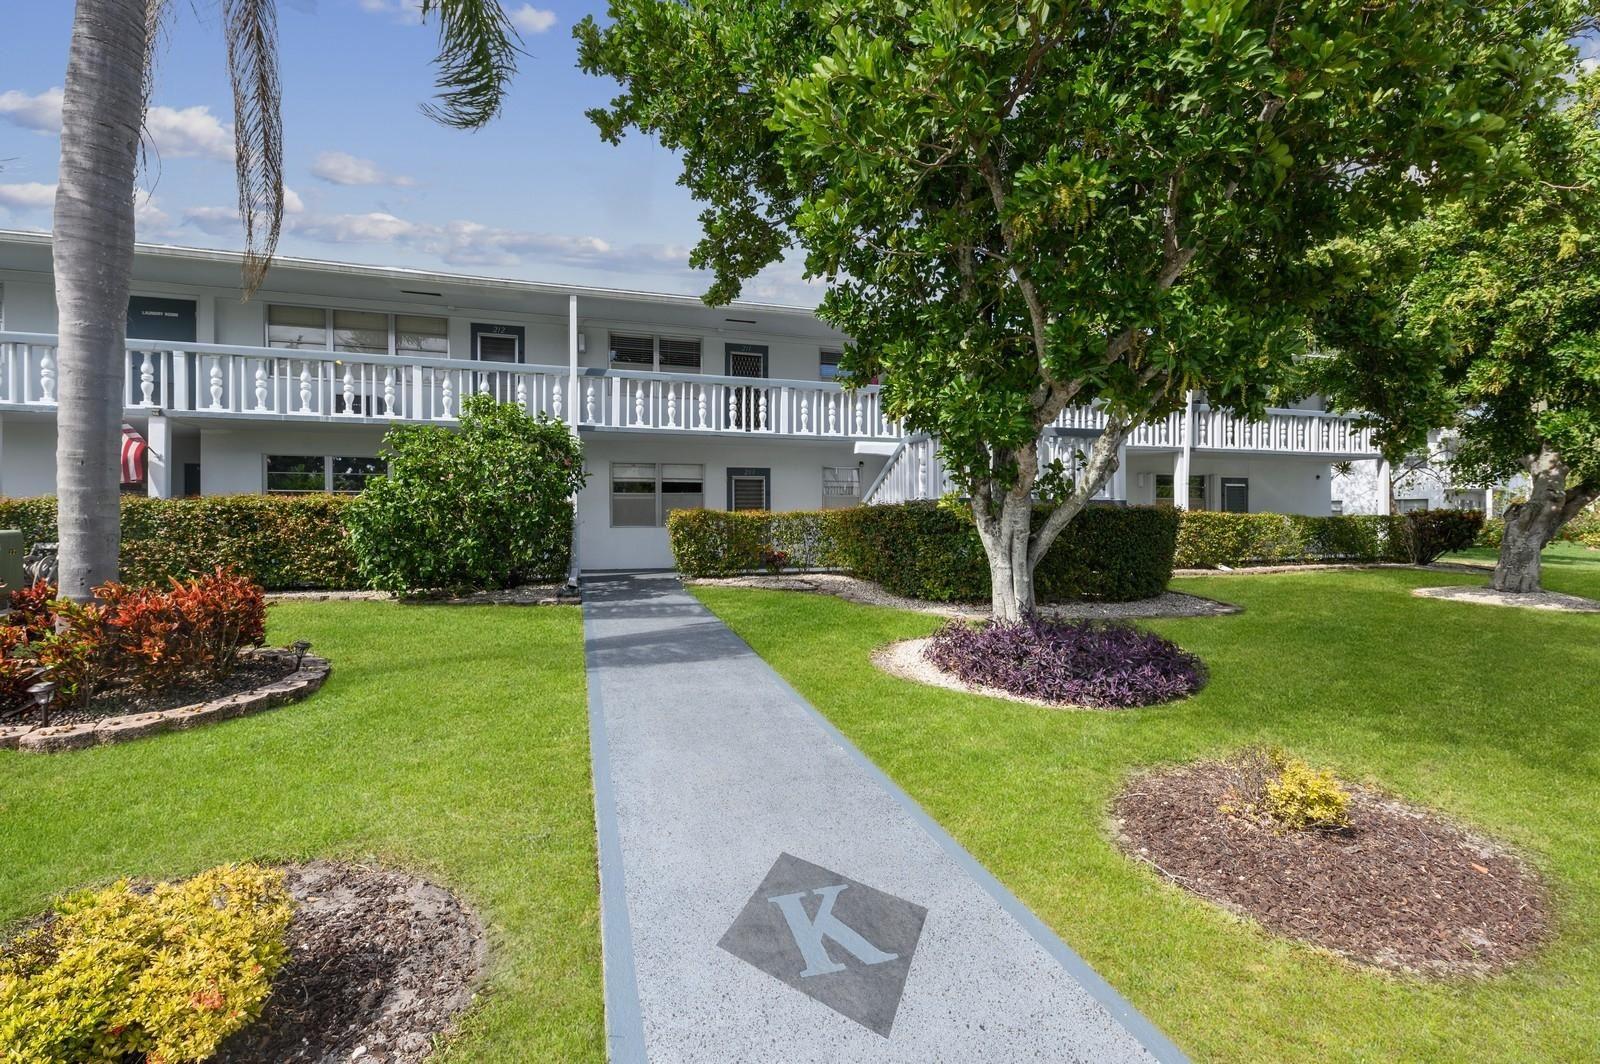 209 Prescott K #209, Deerfield Beach, FL 33442 - #: RX-10604776